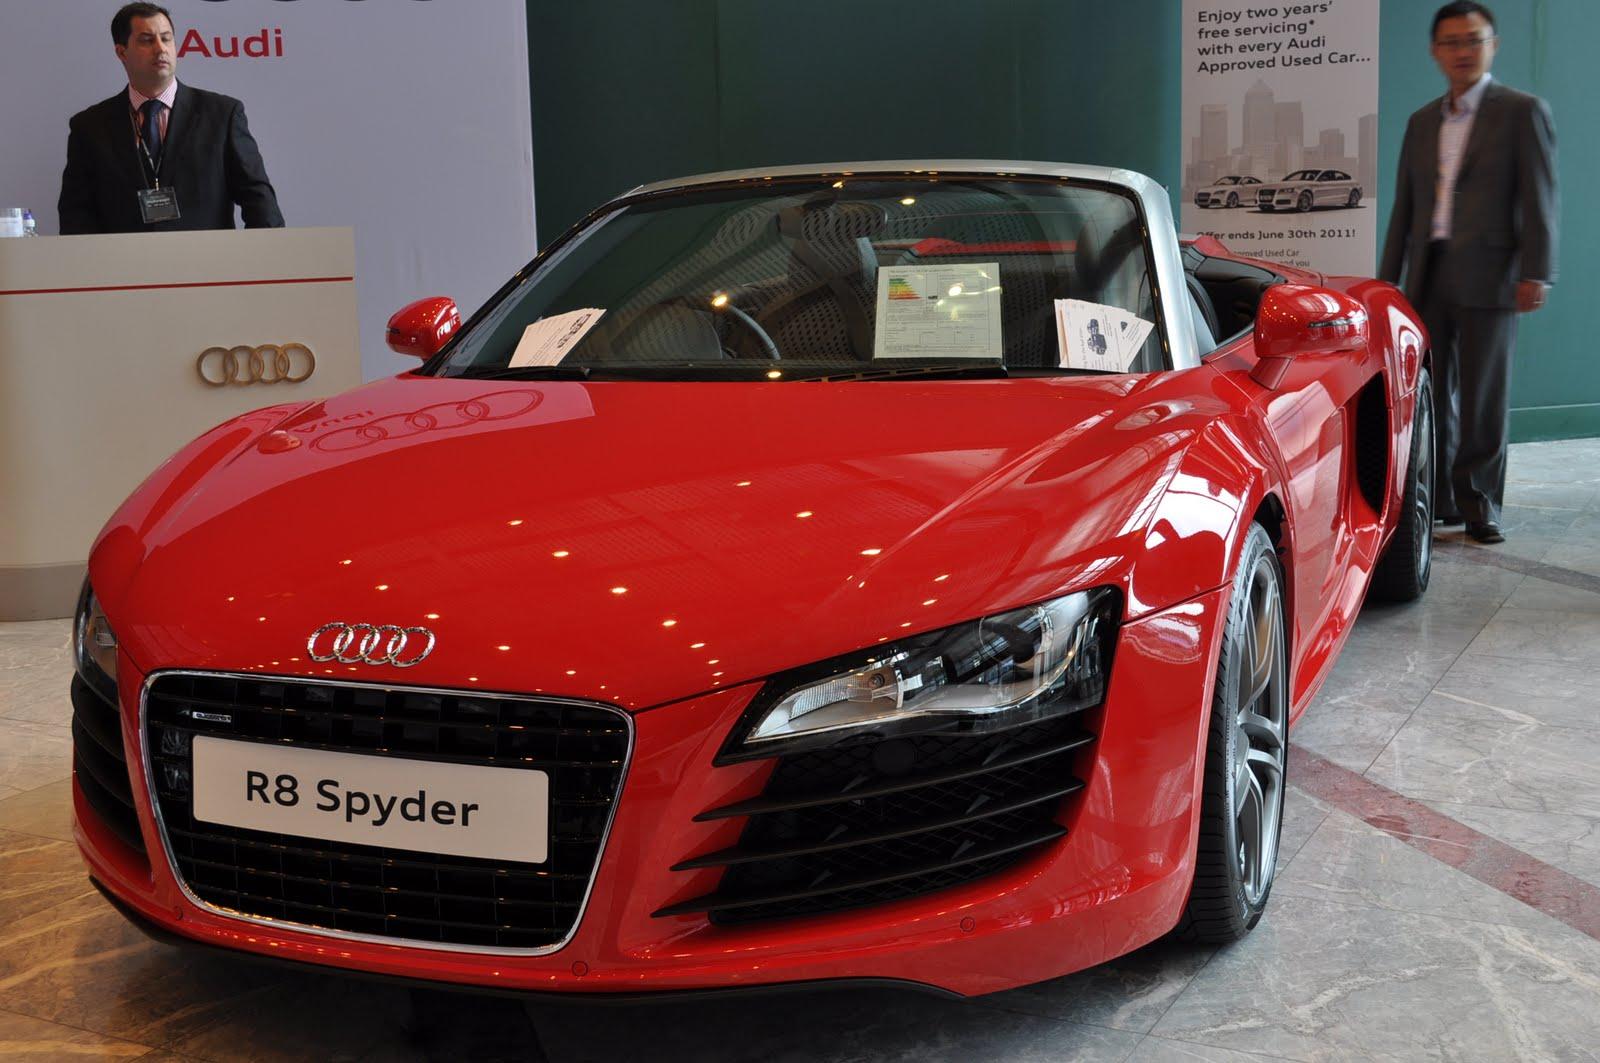 Motorexpo+sports+cars+Canary+Wharf+London+Canada+Square